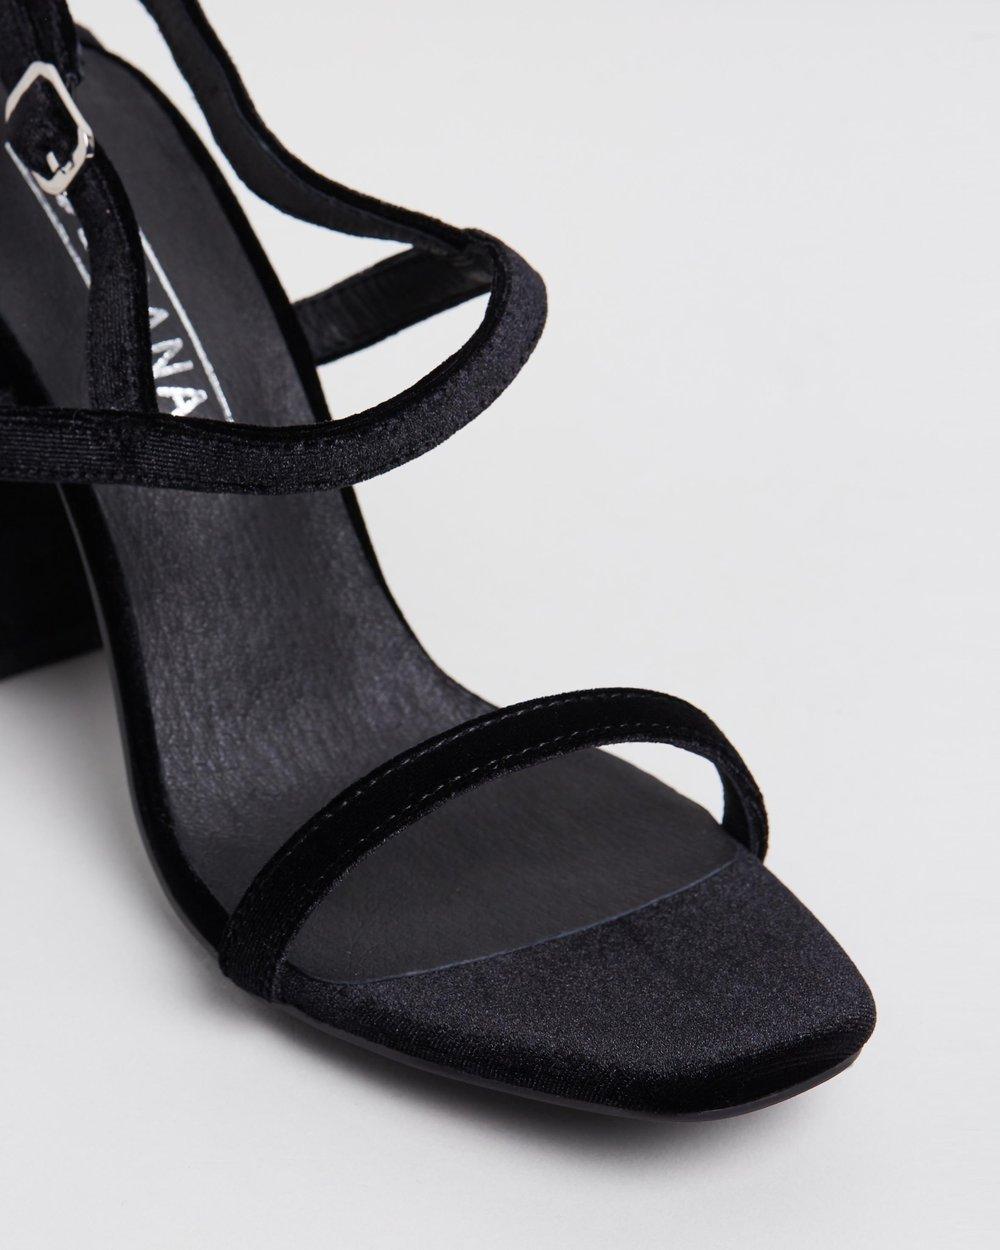 4a5ed88de3c615 Clyde Heels by Sol Sana Online